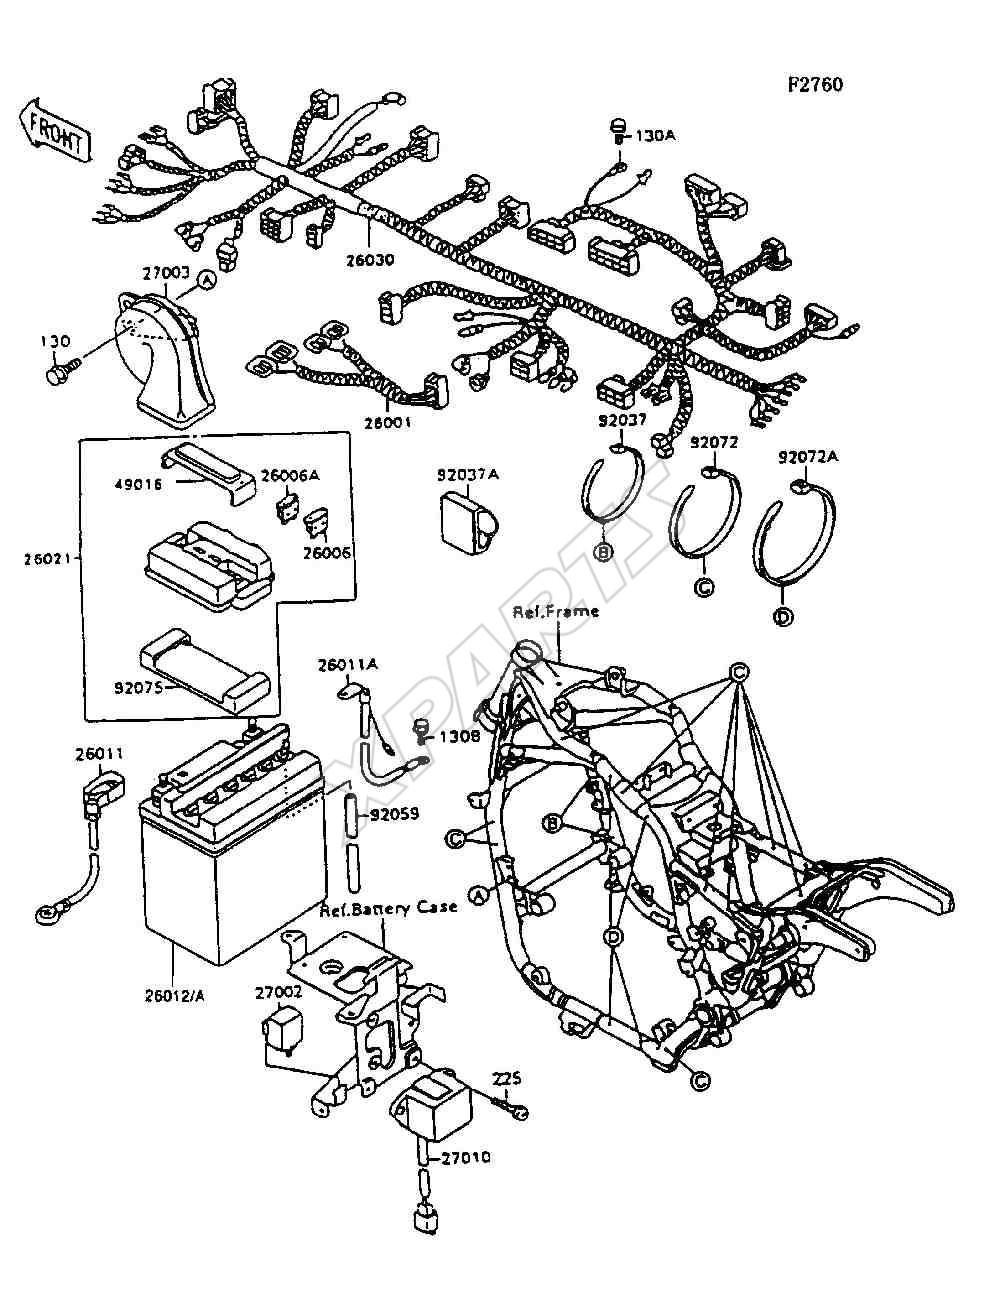 06 vulcan 1500 wiring diagram